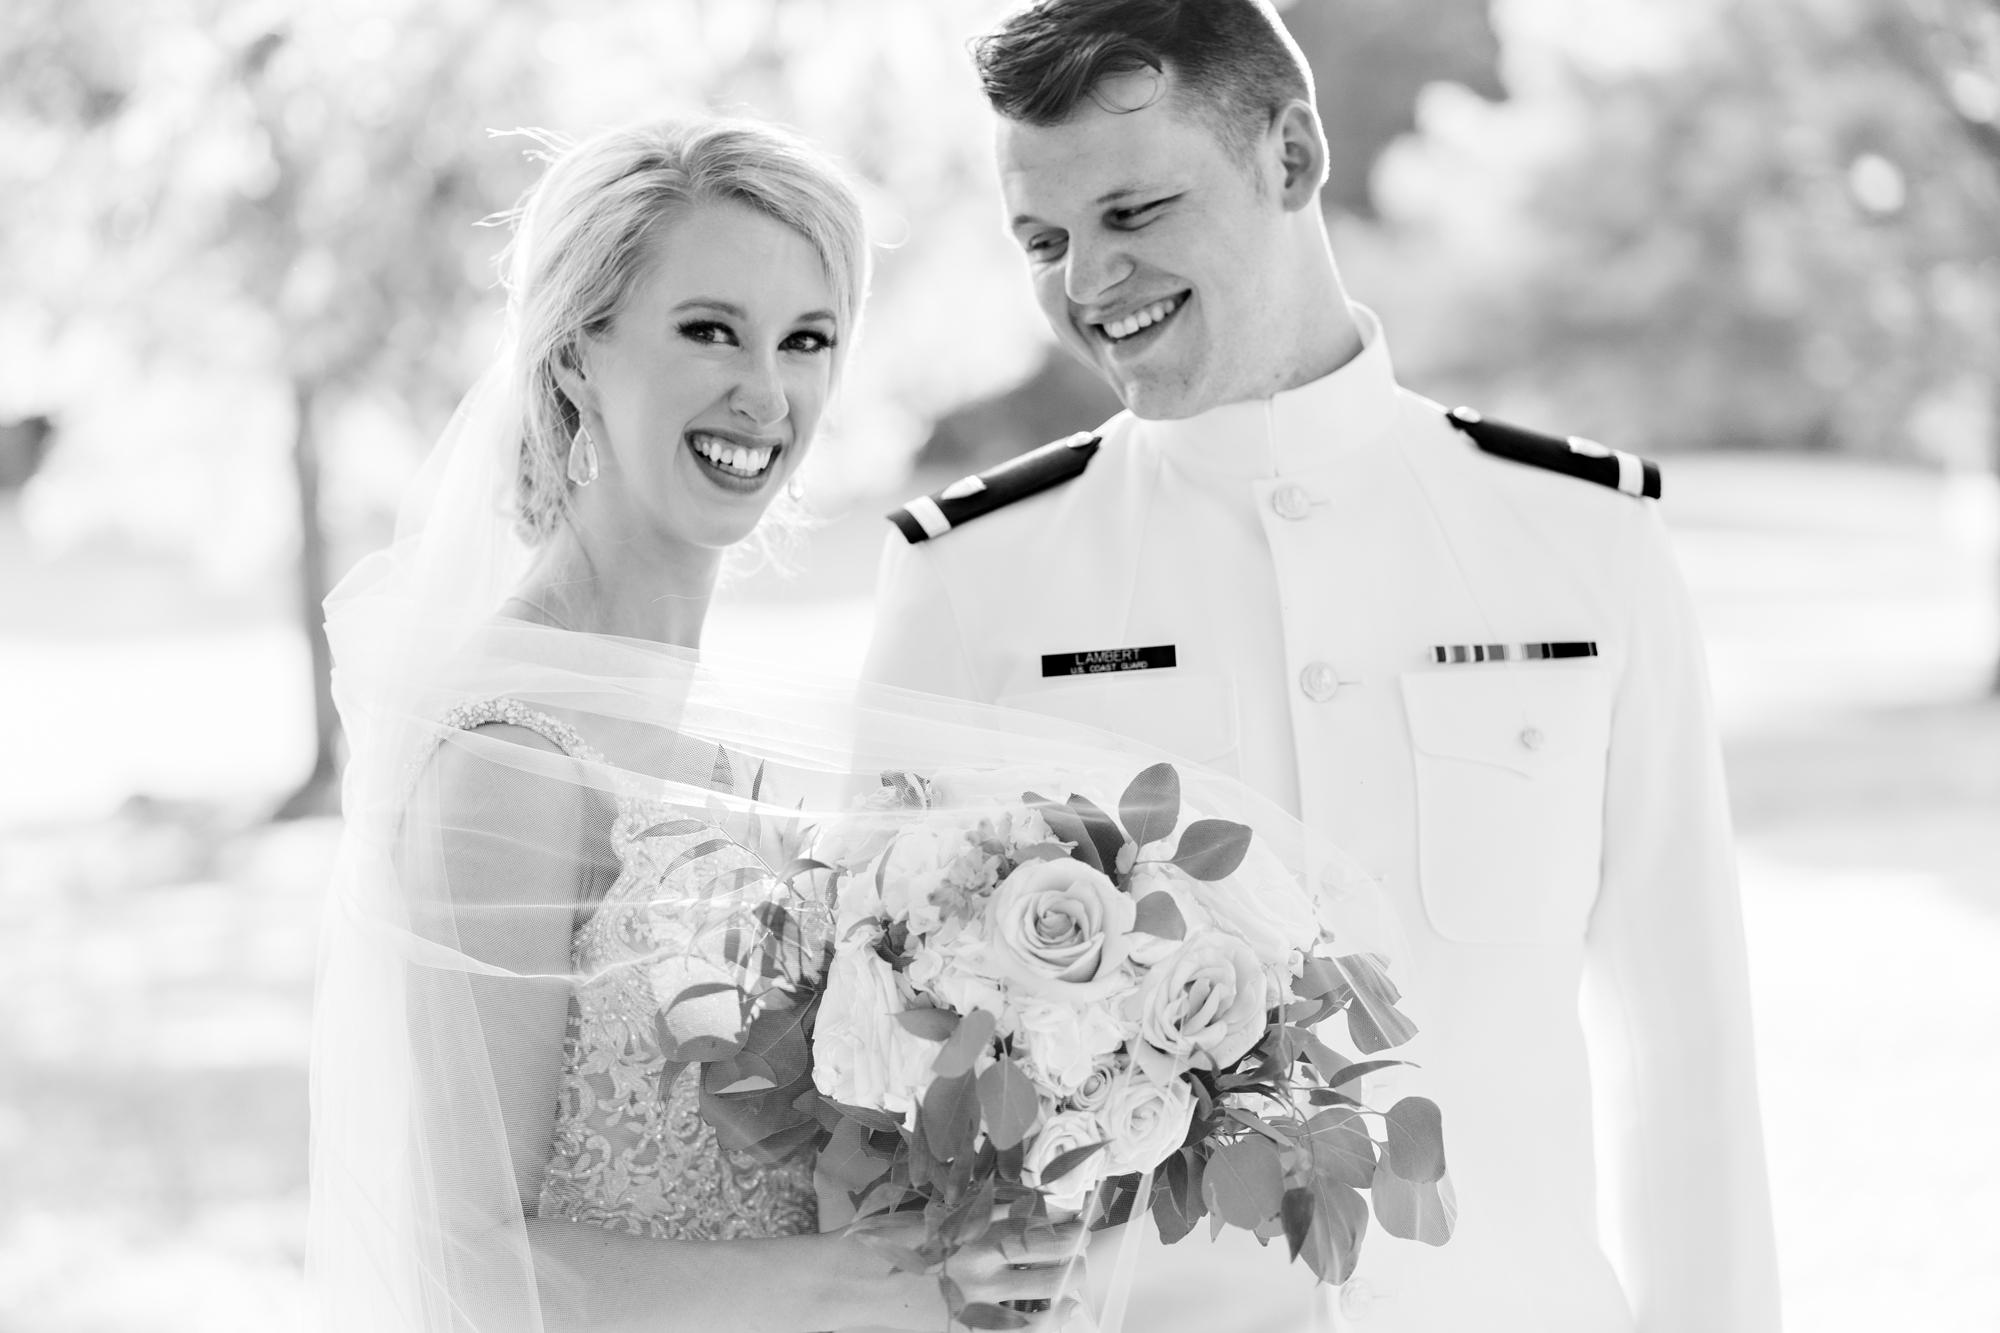 Alabama-Photographers-Nick-Drollette-Wedding-Photography-145.jpg